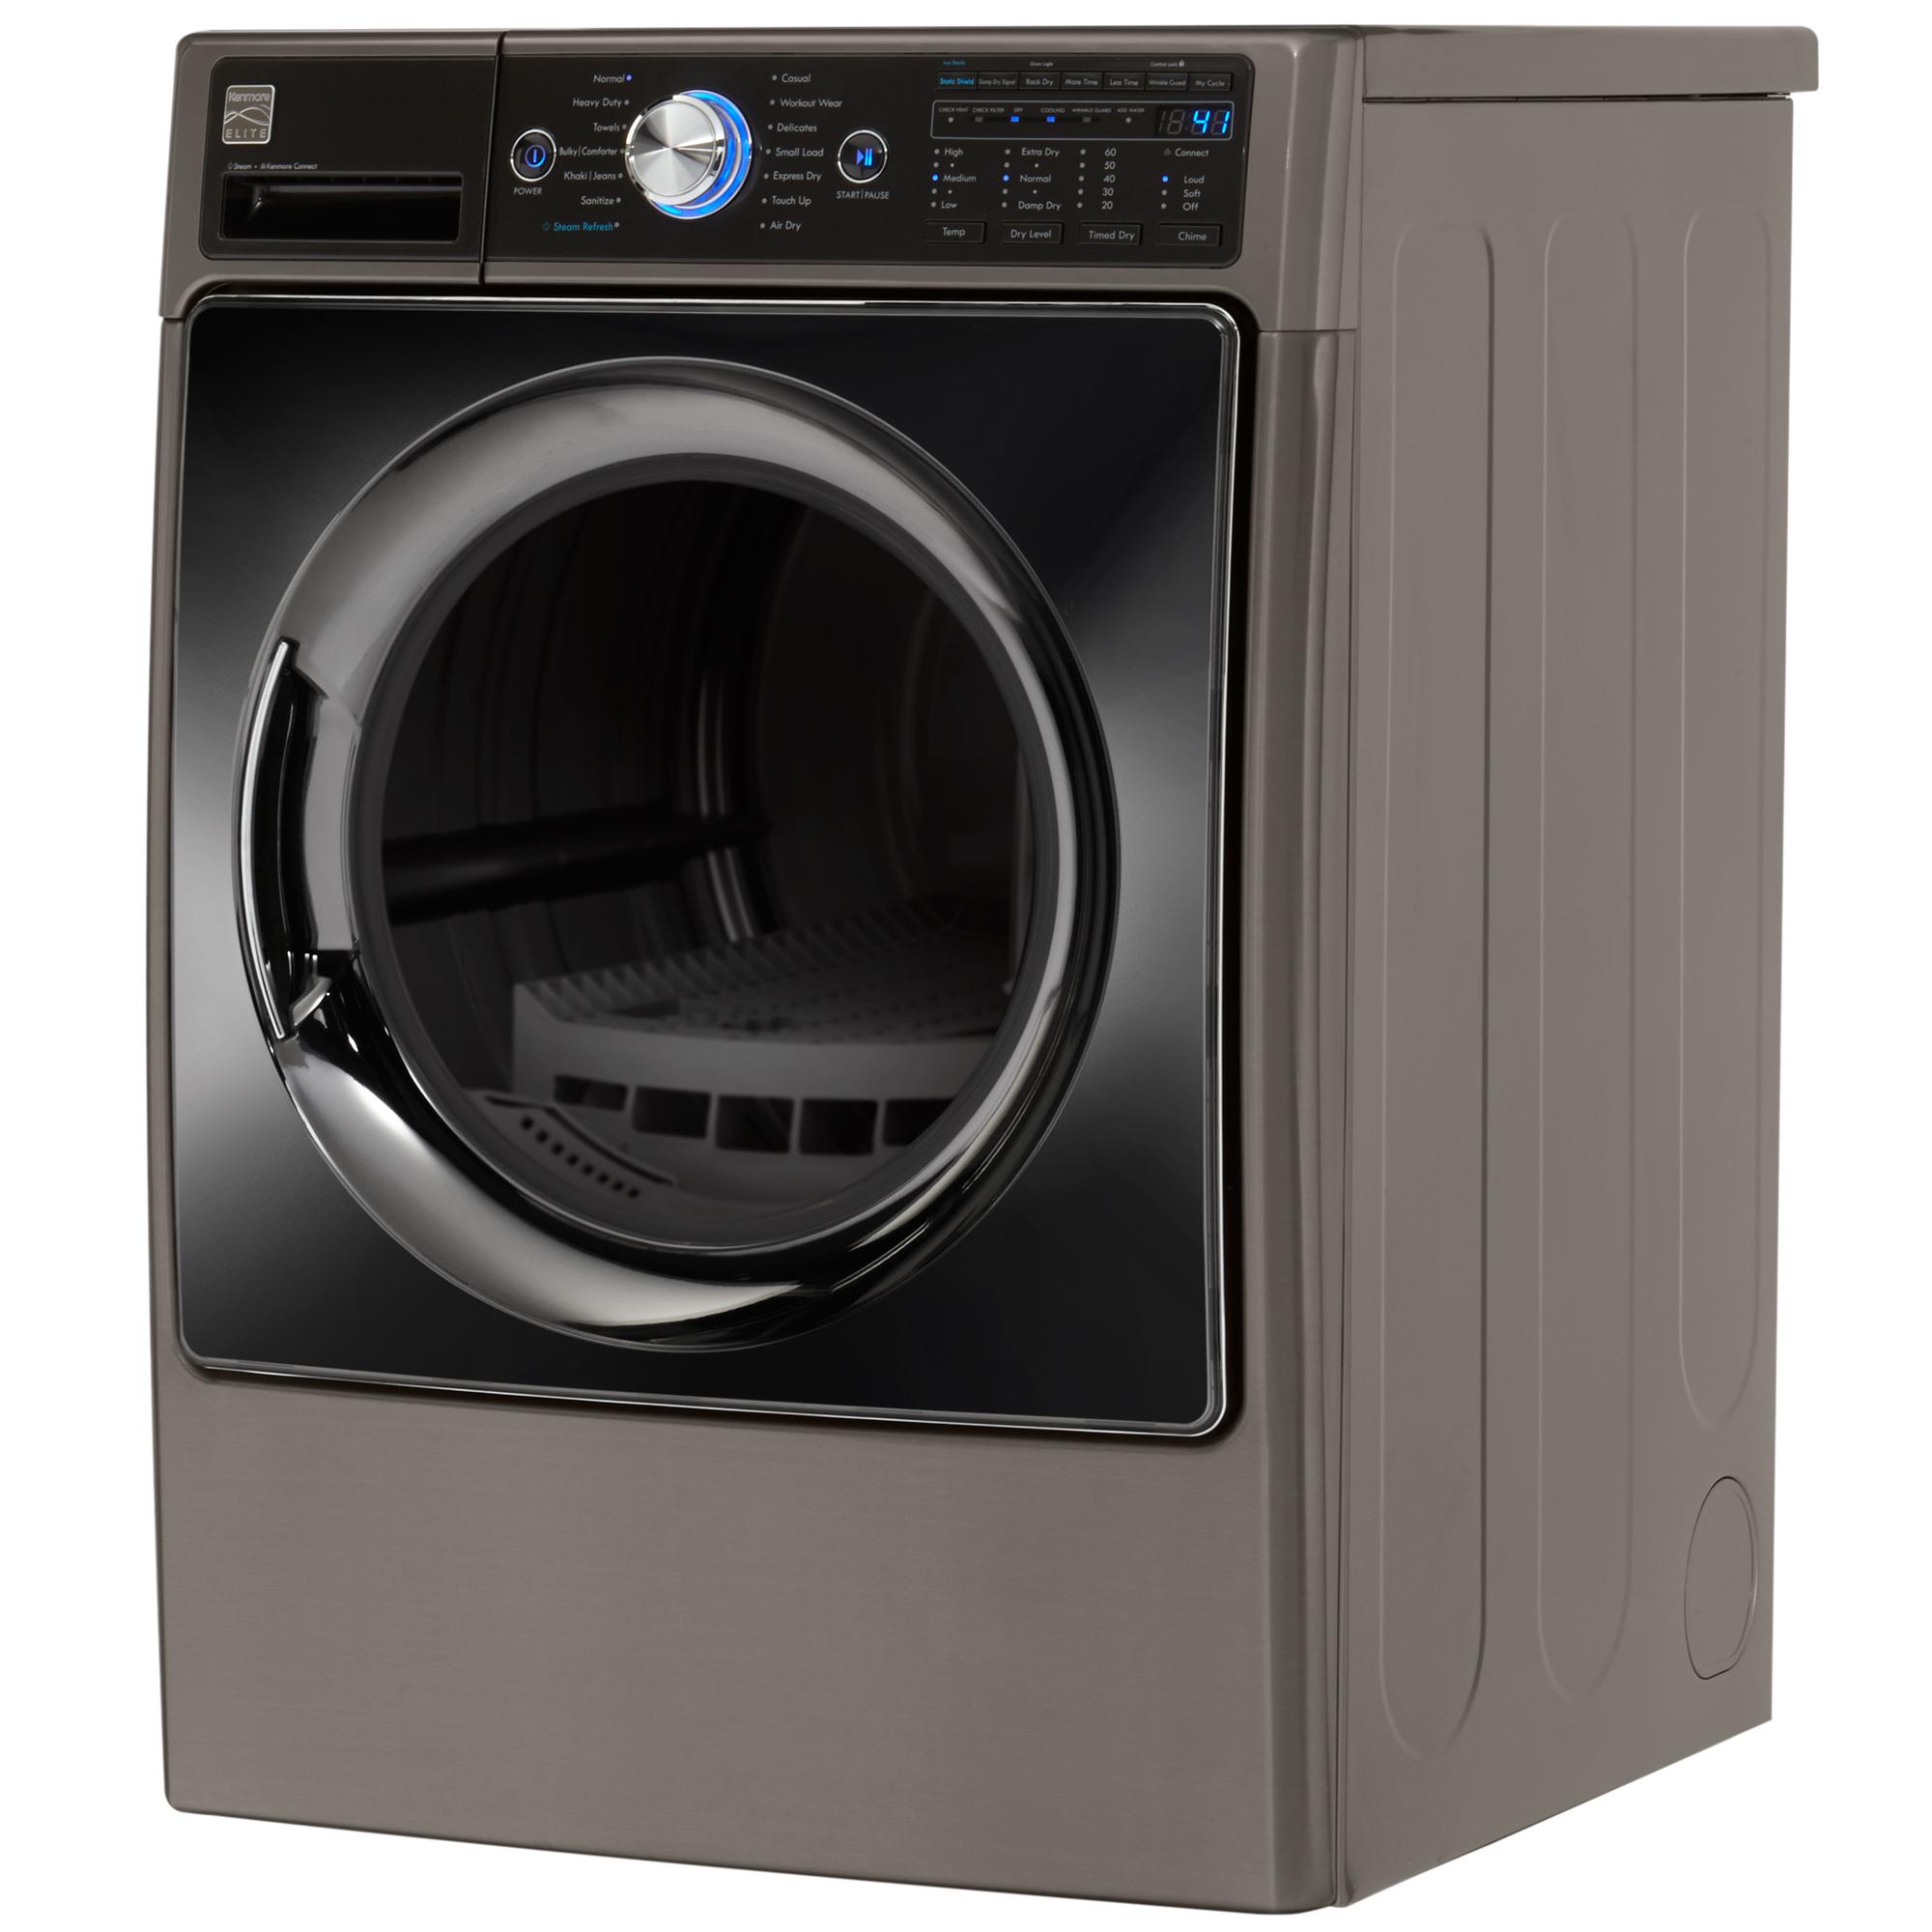 Kenmore Elite 91583 7.4 cu. ft. Gas Dryer with Steam – Metallic Silver